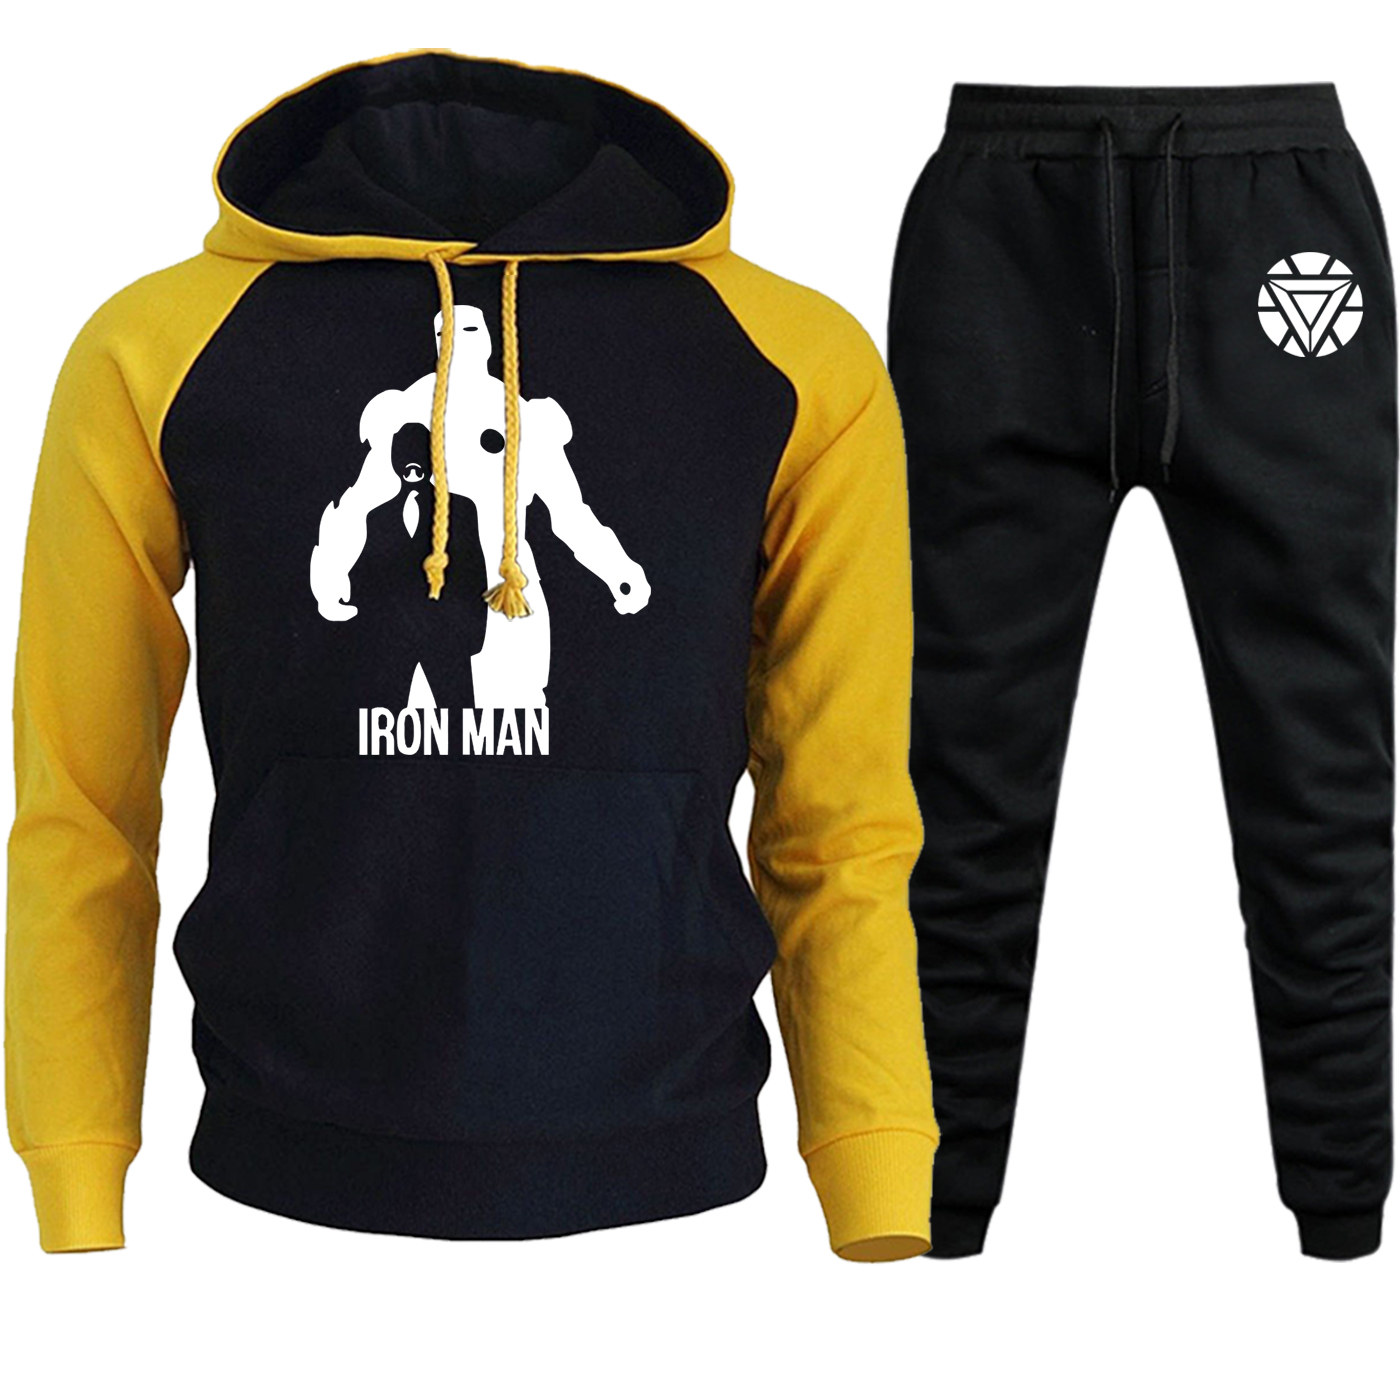 The Avengers Hooded Raglan Men Iron Man Sweatshirts Autumn Winter 2019 Suit Male Casual Pullover Fleece Hoody+Pants 2 Piece Set